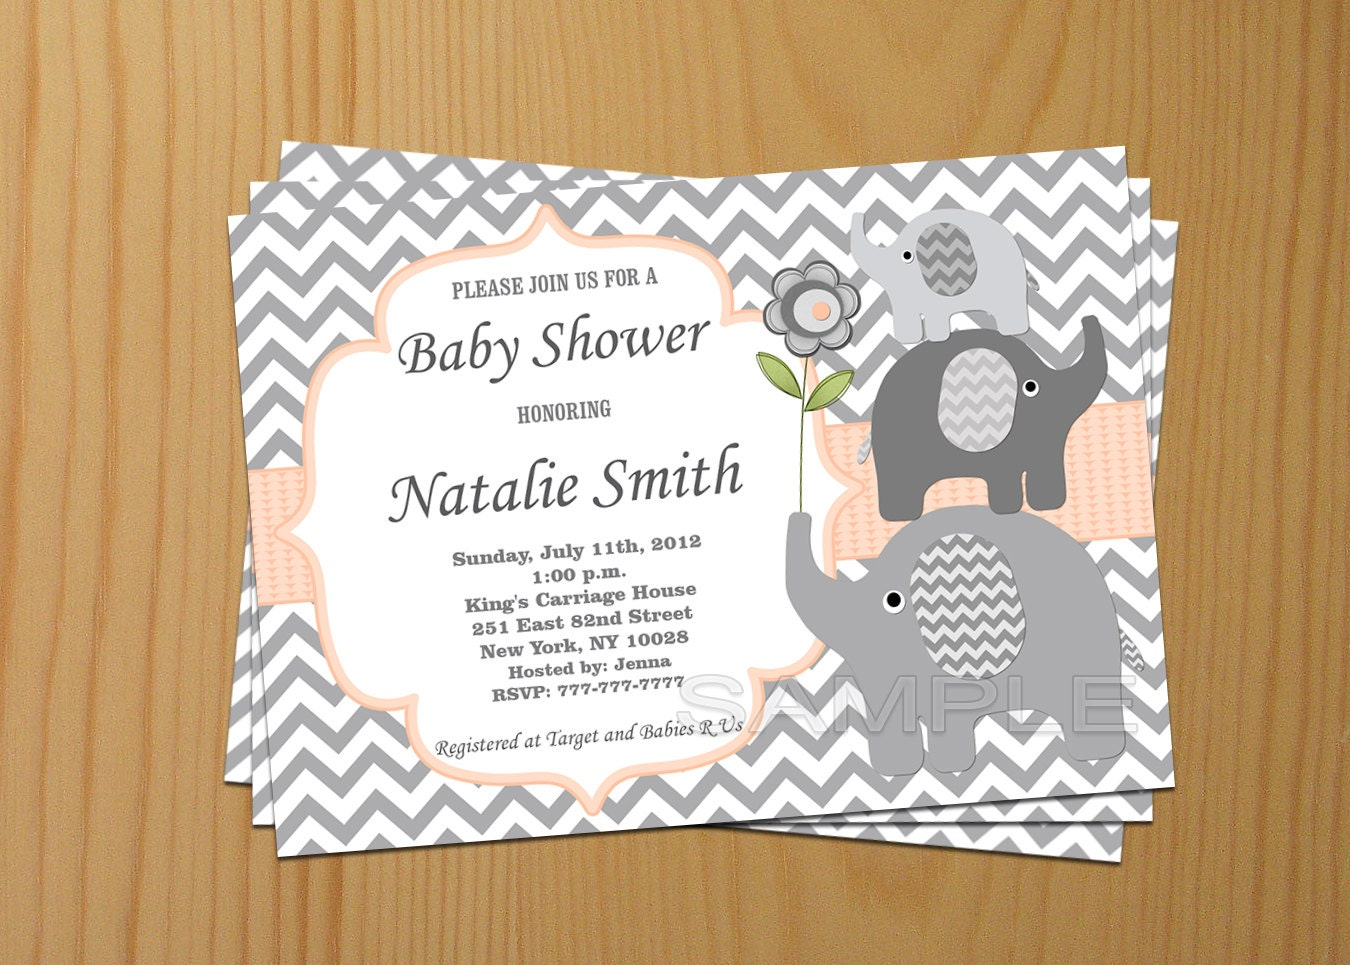 Editable Baby Shower Invitation Elephant Baby Shower – Editable Baby Shower Invitations